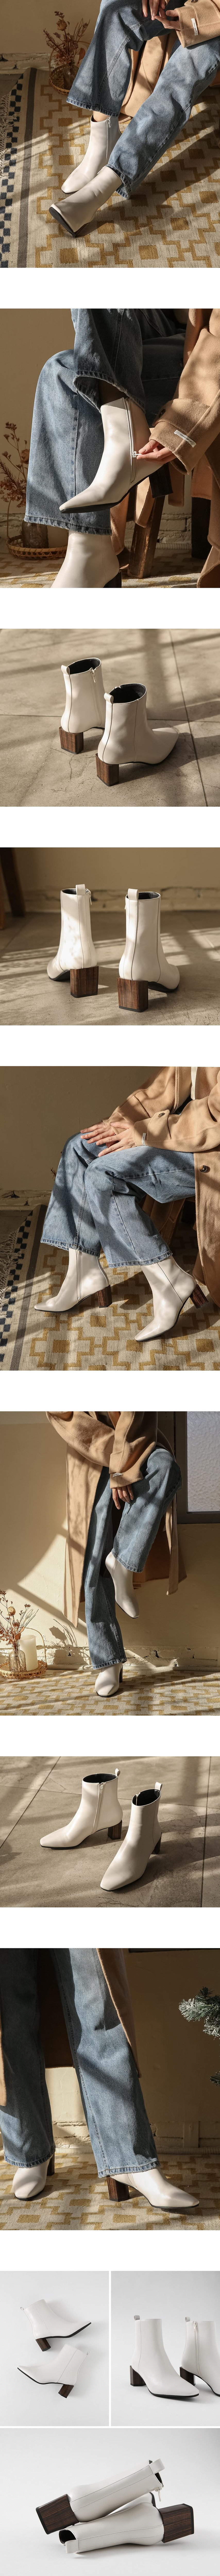 Rambus Five-legged Wood Heel Ankle Boots BSLTS4c224